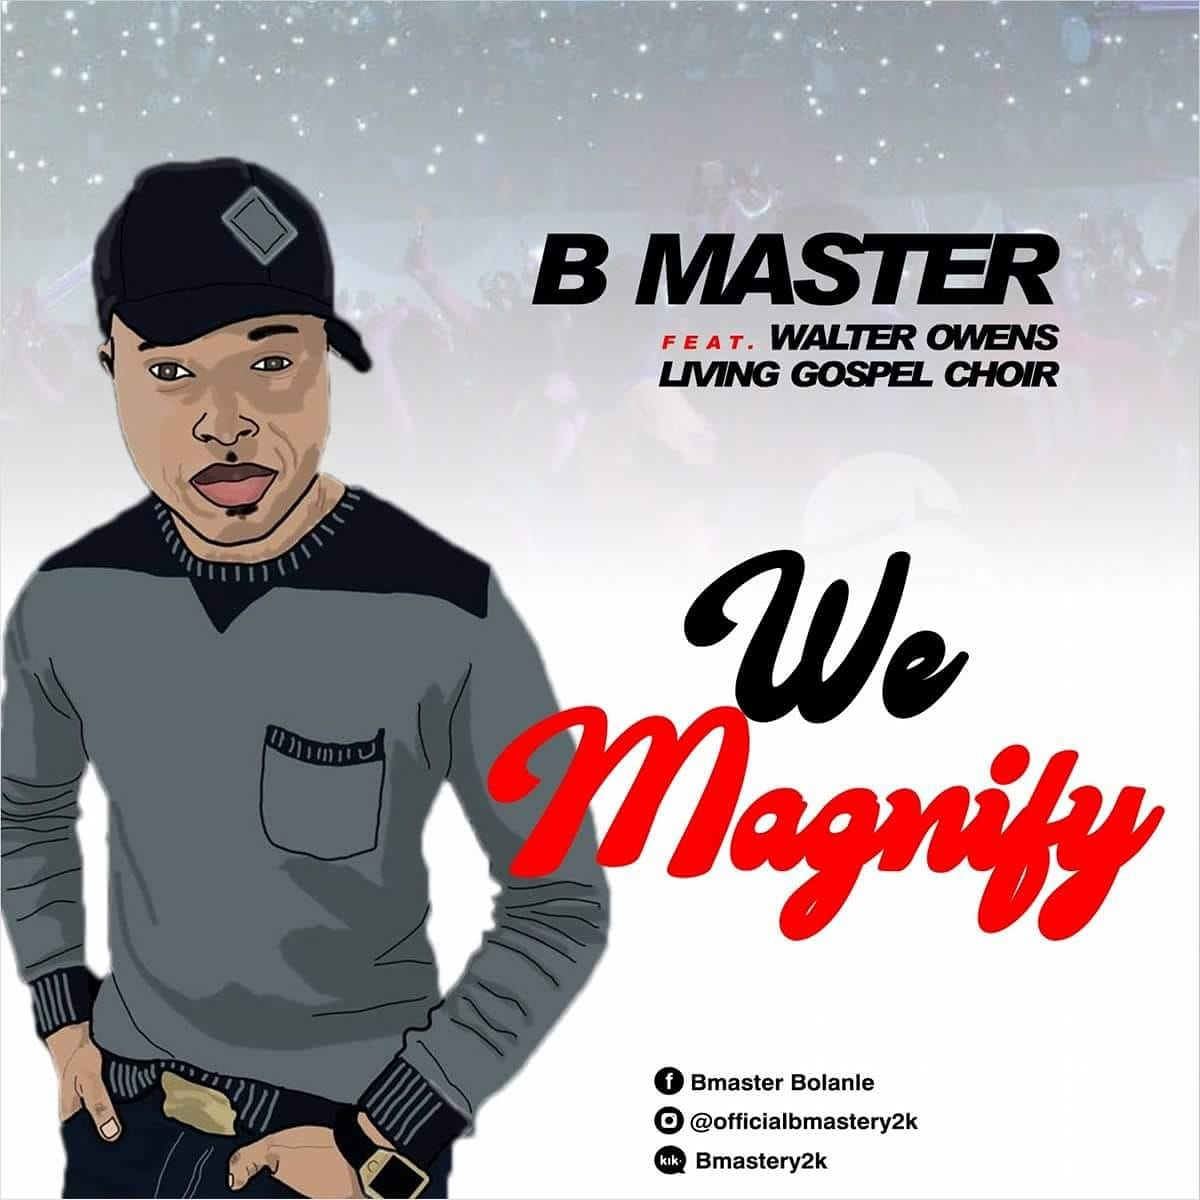 We Magnify - Bmaster